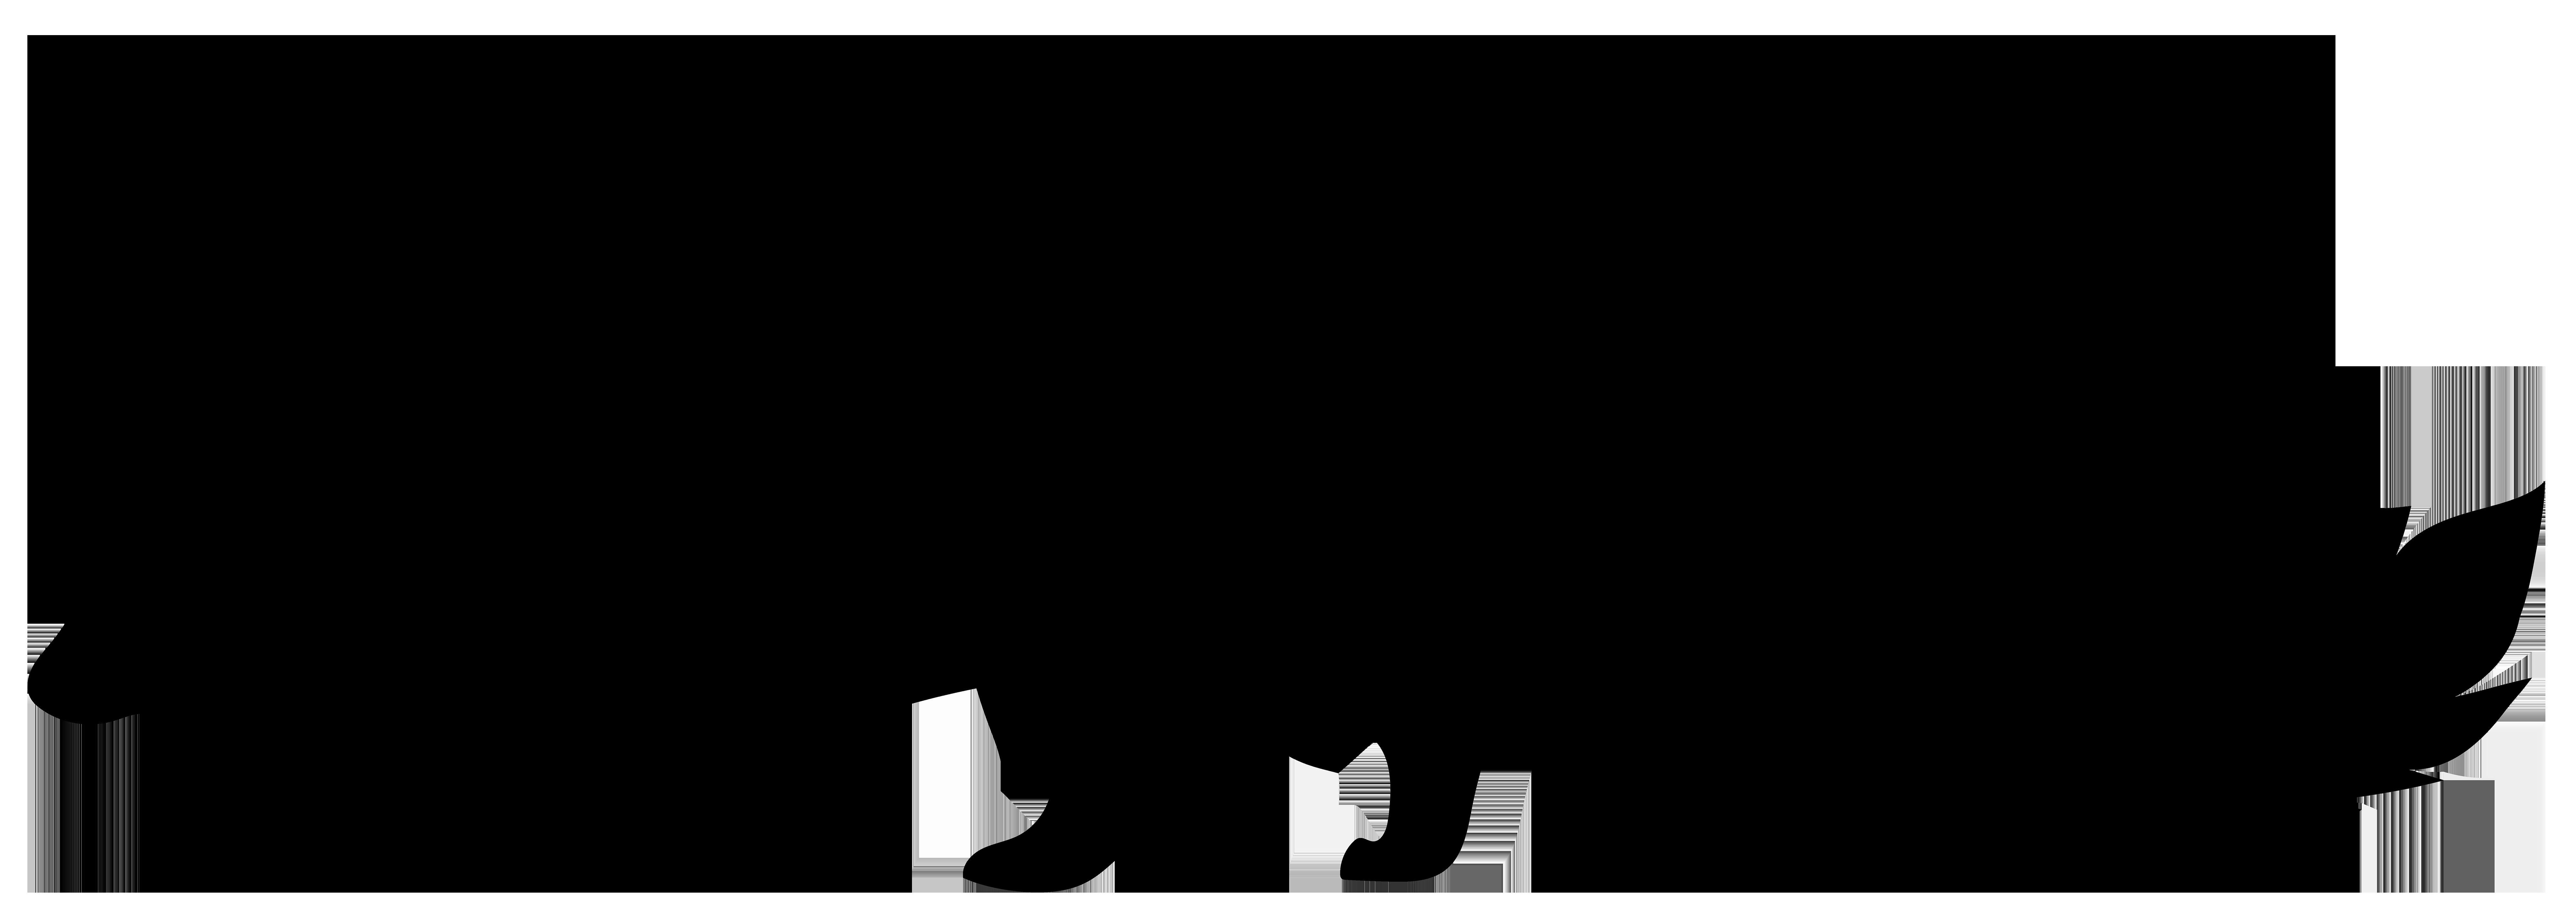 Skunk silhouette clipart vector transparent download Skunk Silhouette PNG Transparent Clip Art Image | Gallery ... vector transparent download